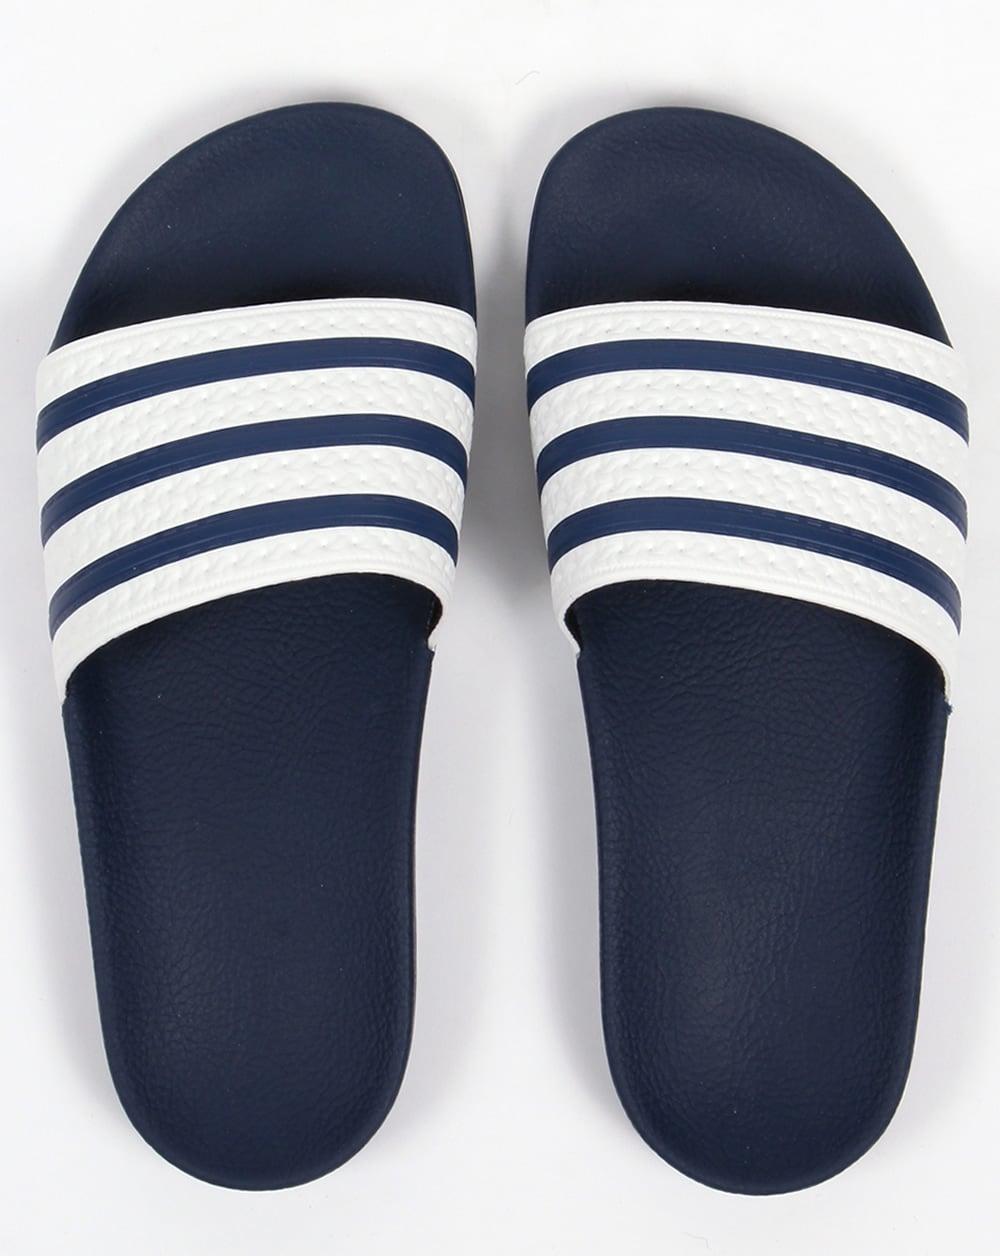 Adidas Adilette Slides White/Navy